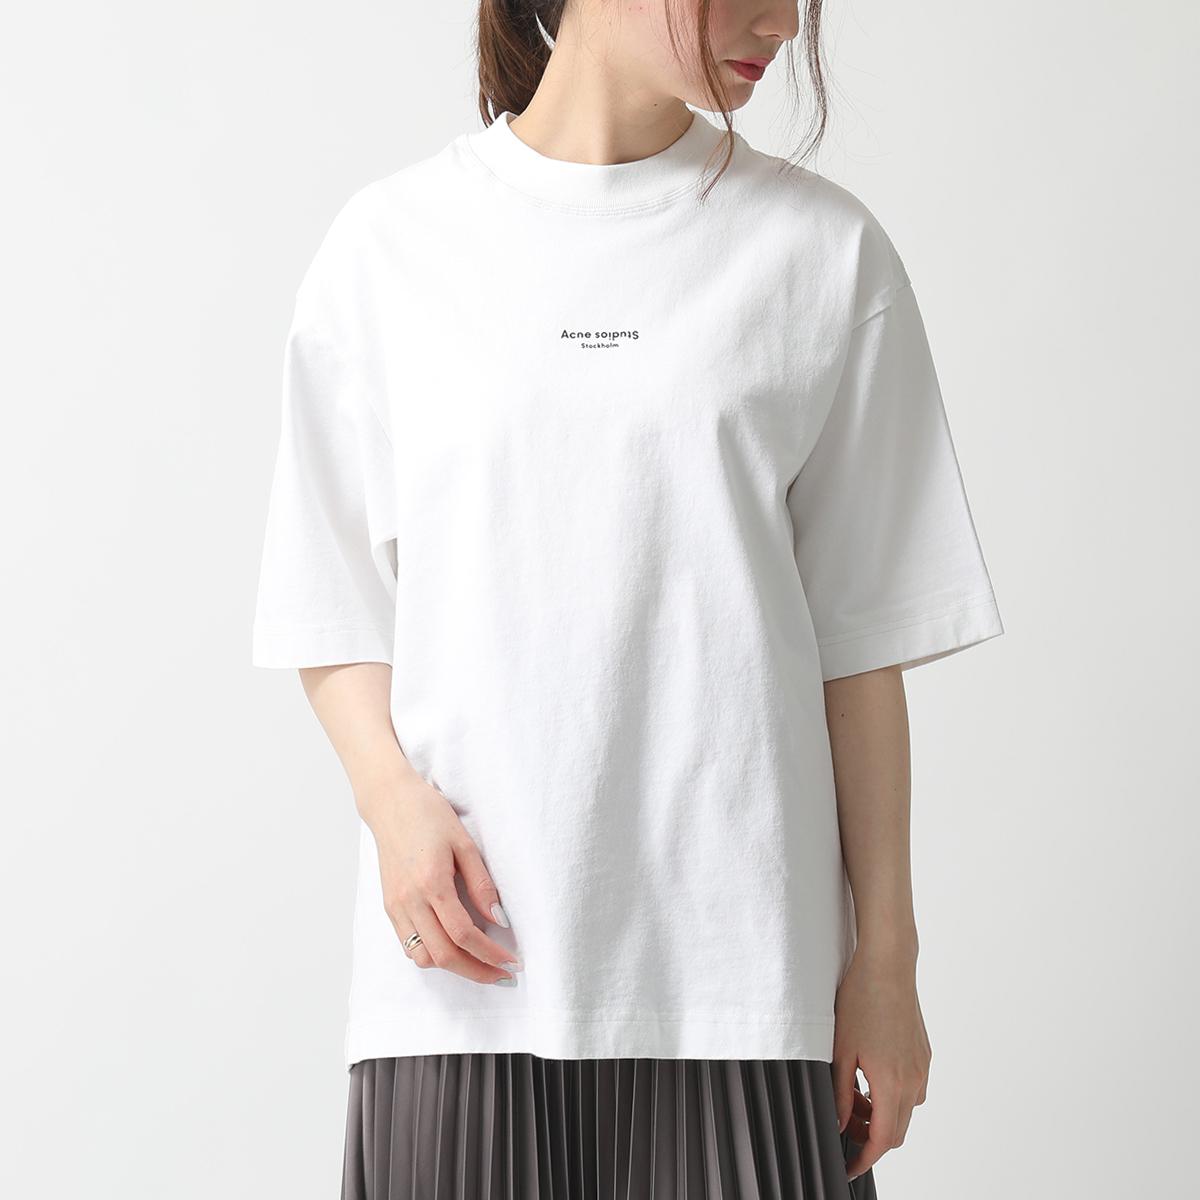 Acne Studios アクネストゥディオズ FN NM TSHI000138 EXTORR リバースロゴ 半袖 Tシャツ クルーネック コットン Optic-White レディース